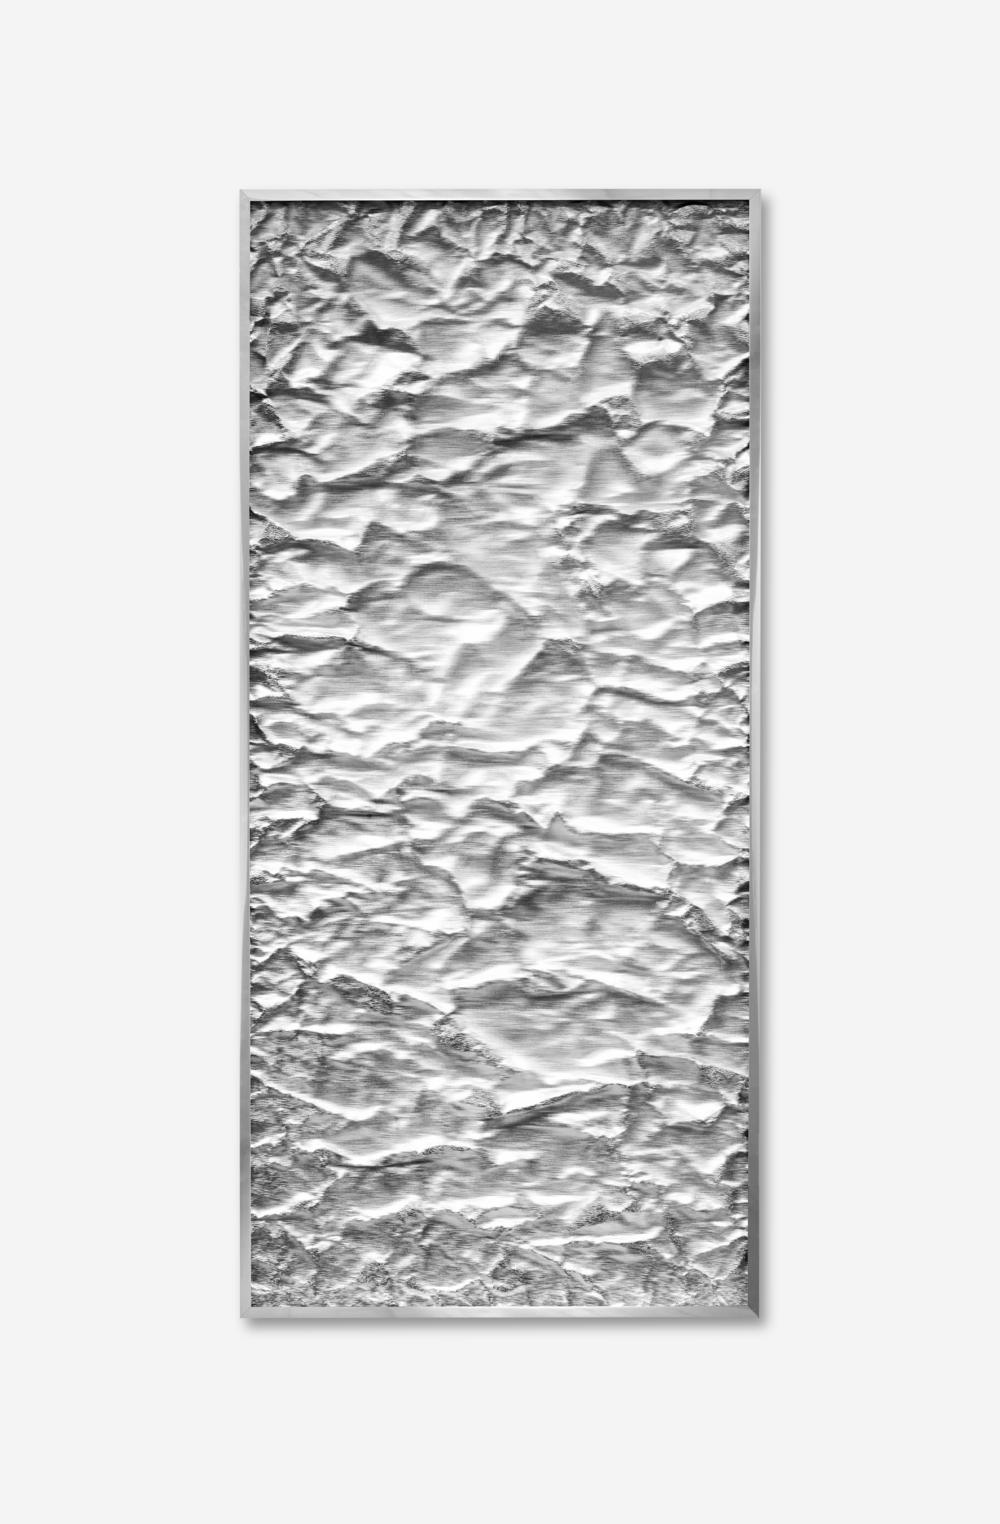 Tabula Rasa / Part XIV,  2018 Industrial aluminium beneath structured Plexiglas, aluminium frame 152 x 72 cm (60 x 28 in)